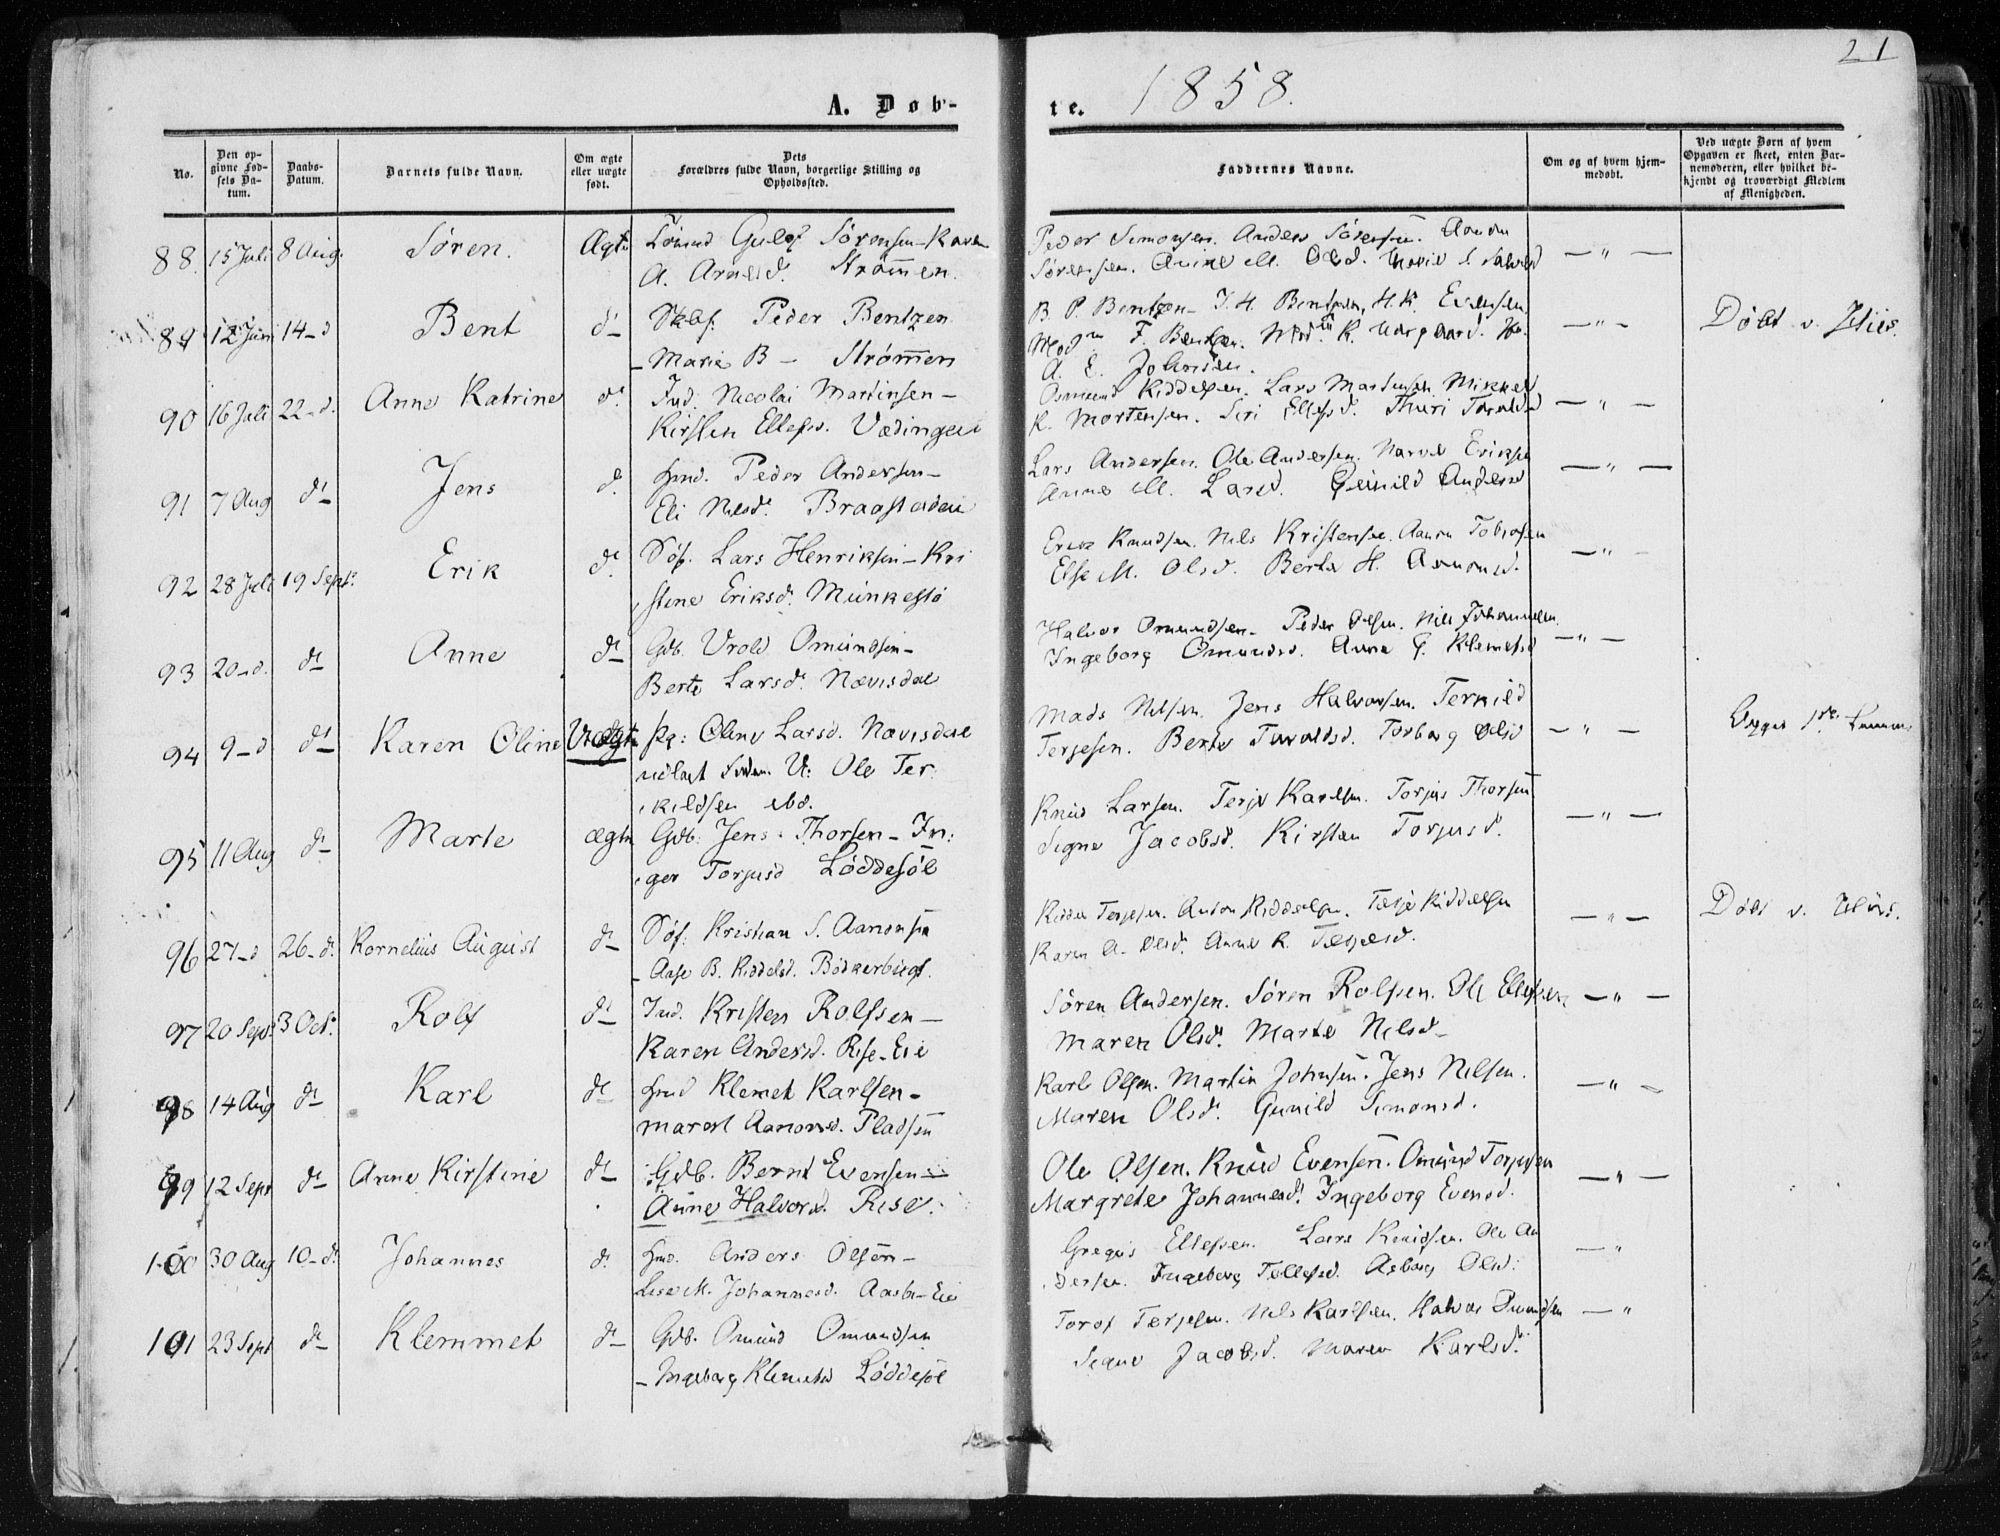 SAK, Øyestad sokneprestkontor, F/Fa/L0015: Ministerialbok nr. A 15, 1857-1873, s. 21